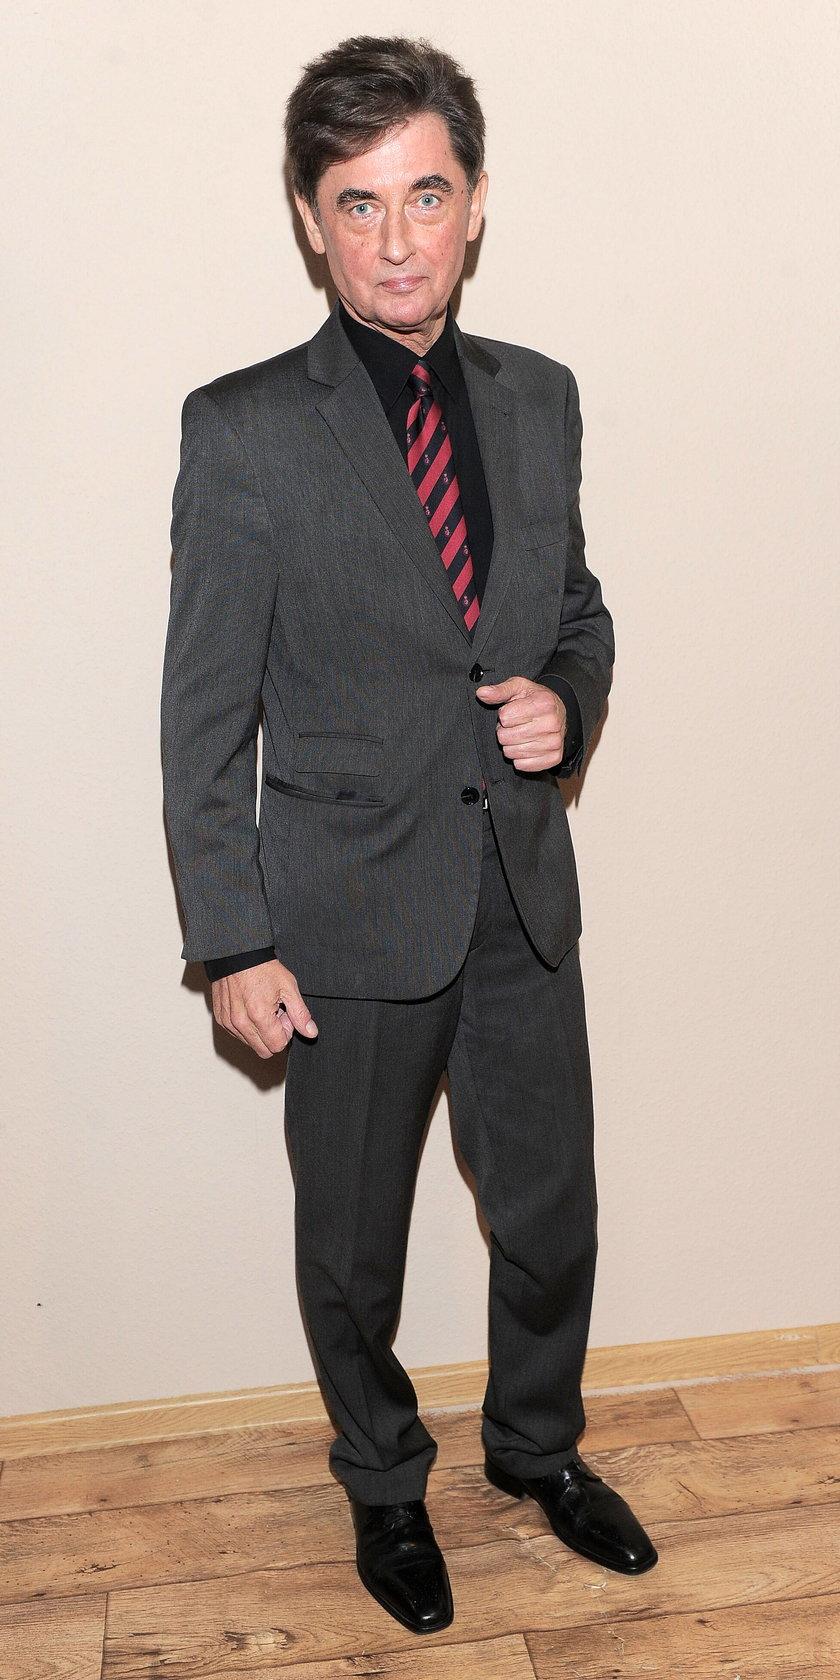 Jan Piechociński